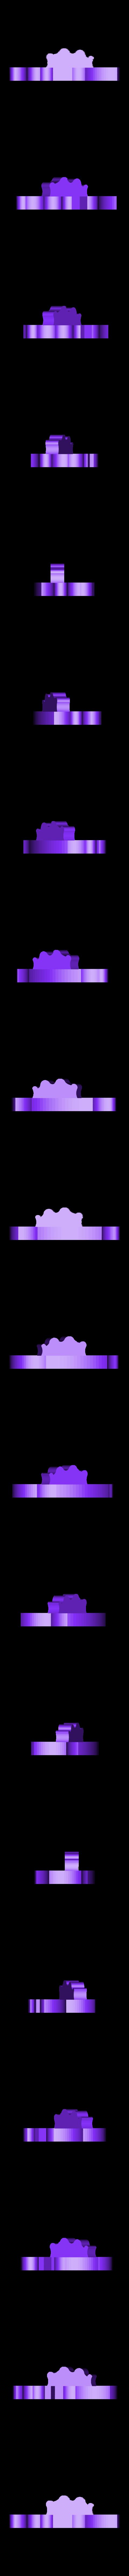 UpLeg.stl Download free STL file Dinosaur Skel for 3D Printer! - Terry the Dinosaur! • 3D printer model, _aalejandrovr24